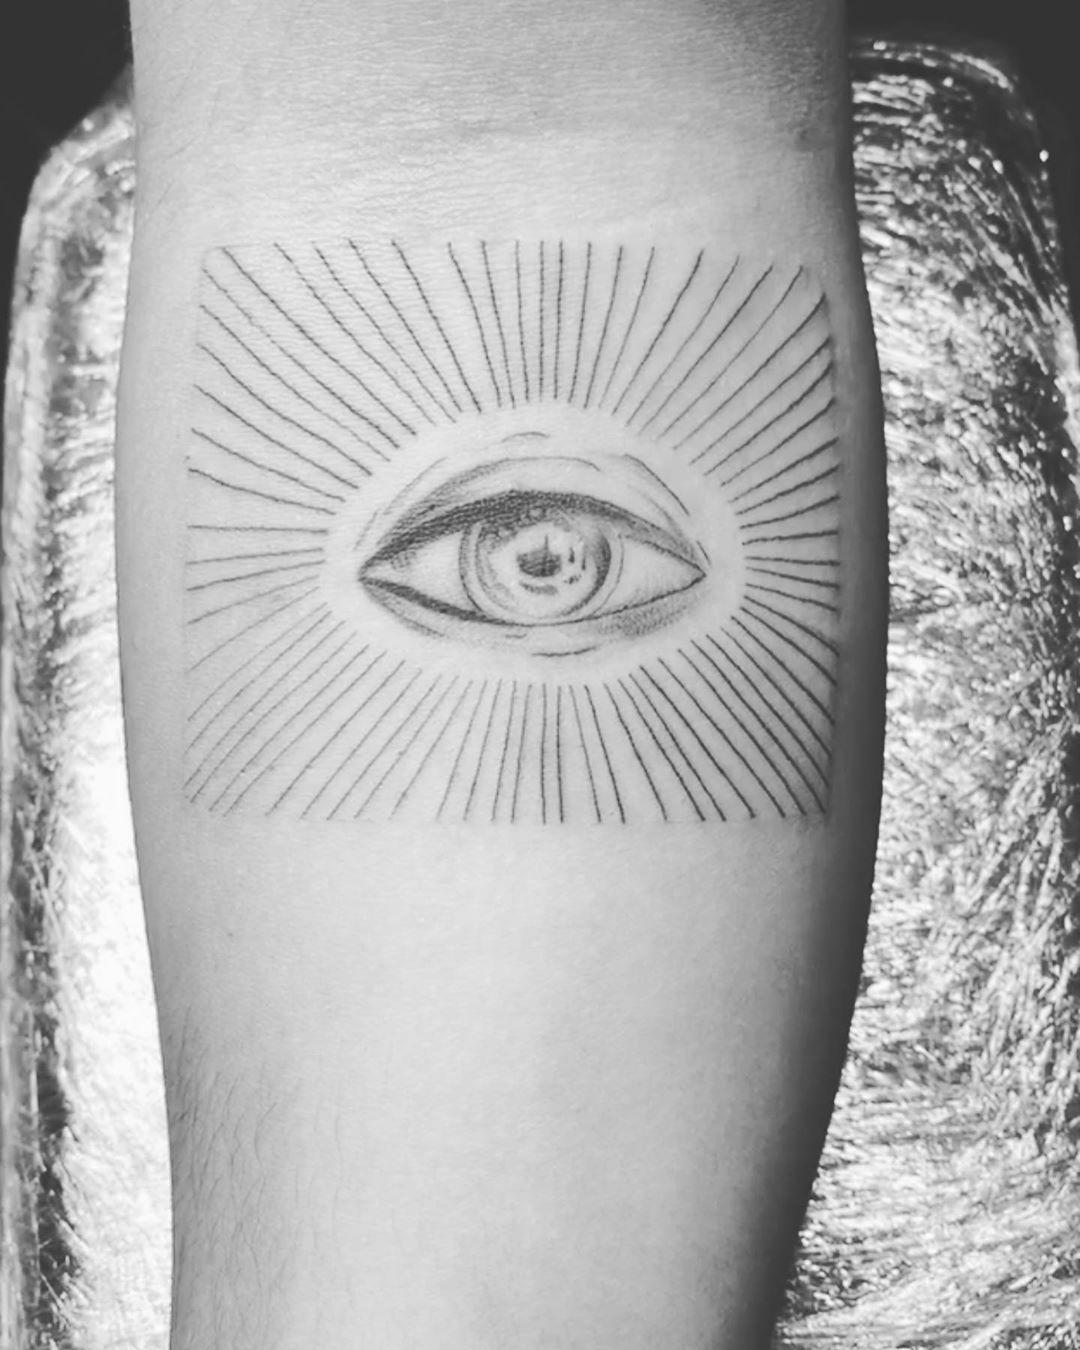 👁 #eye#eyetattoo#simpleeye #tattoo#tattoos#tattooed#tattooideas#tattooartist#tattooinstagram#tattooinstagram#tattoosociety#tattooporn#tattoocommunity#tattooworld#tattooworldwide#tattoomagazine#tattoolovers#dynamicink#dynamicblackink#inked#inkedup#chicagoart#chicago#skinart#skinarttattoo#skintattoo